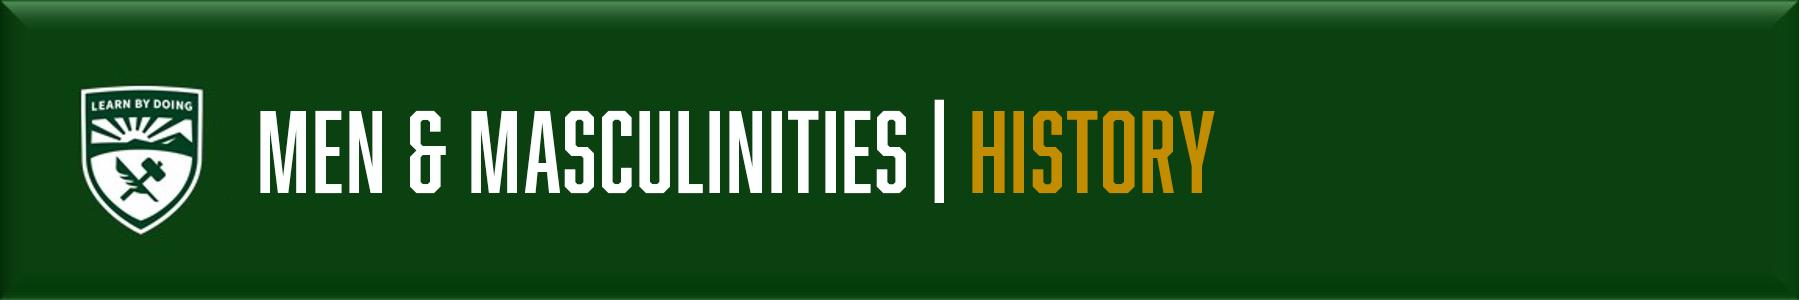 Men & Masculinities - History